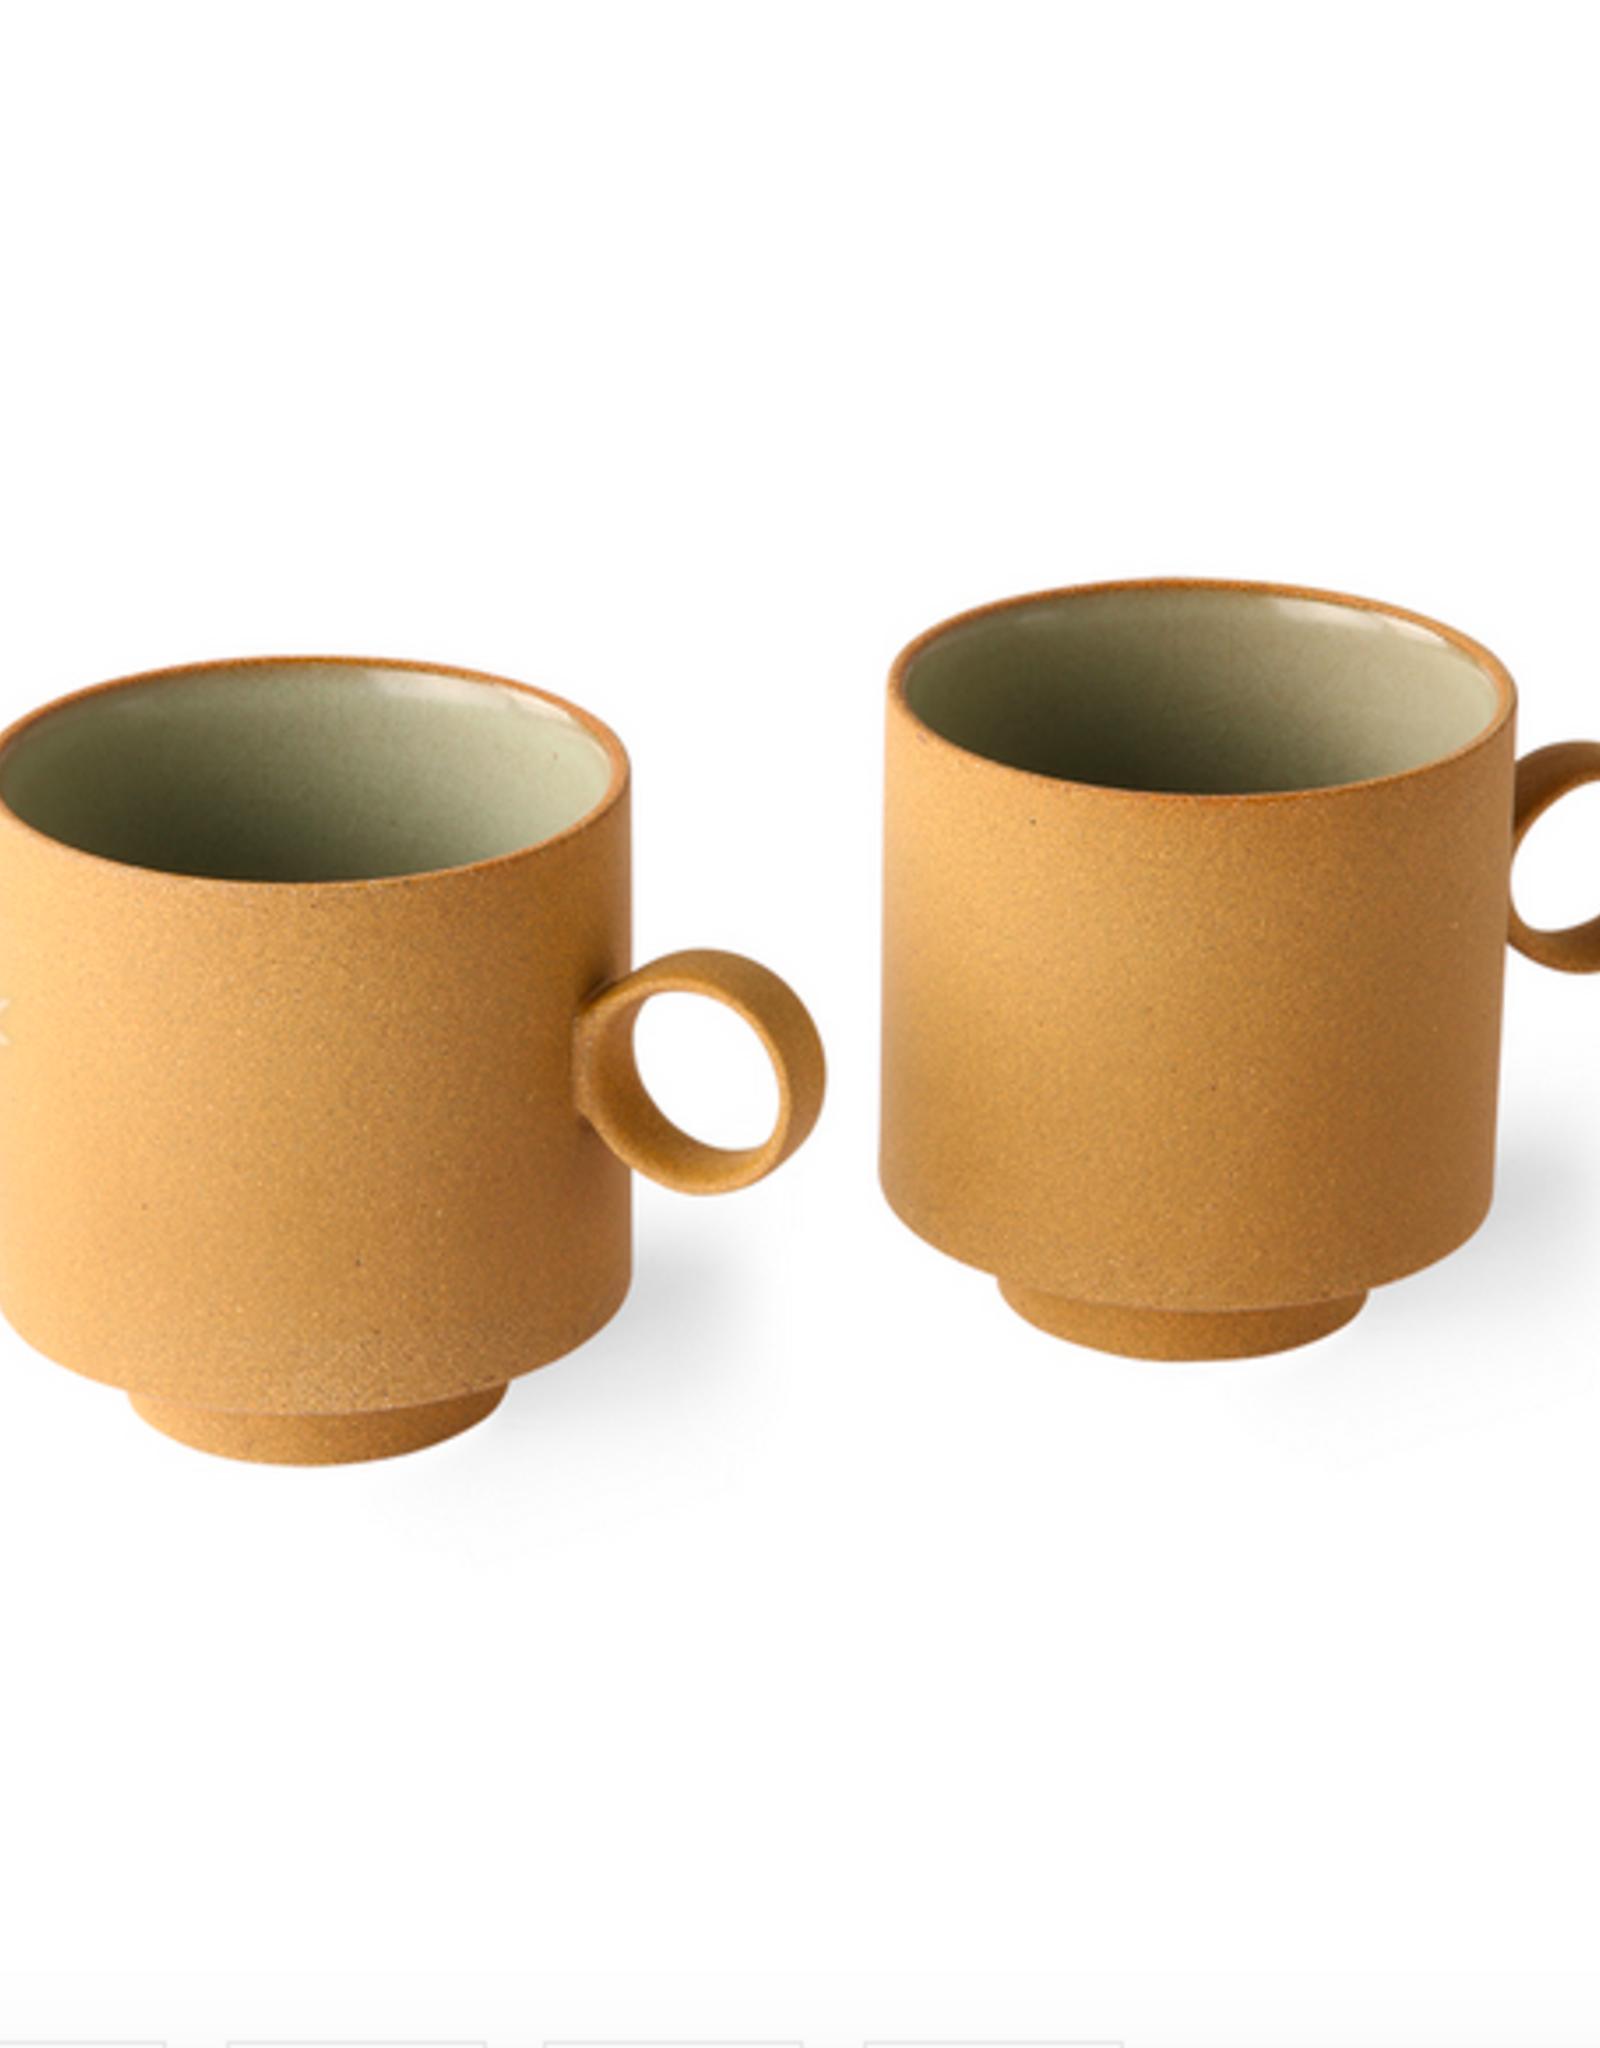 HK Living bold&basic ceramics: coffee mug ochre (set of 2)